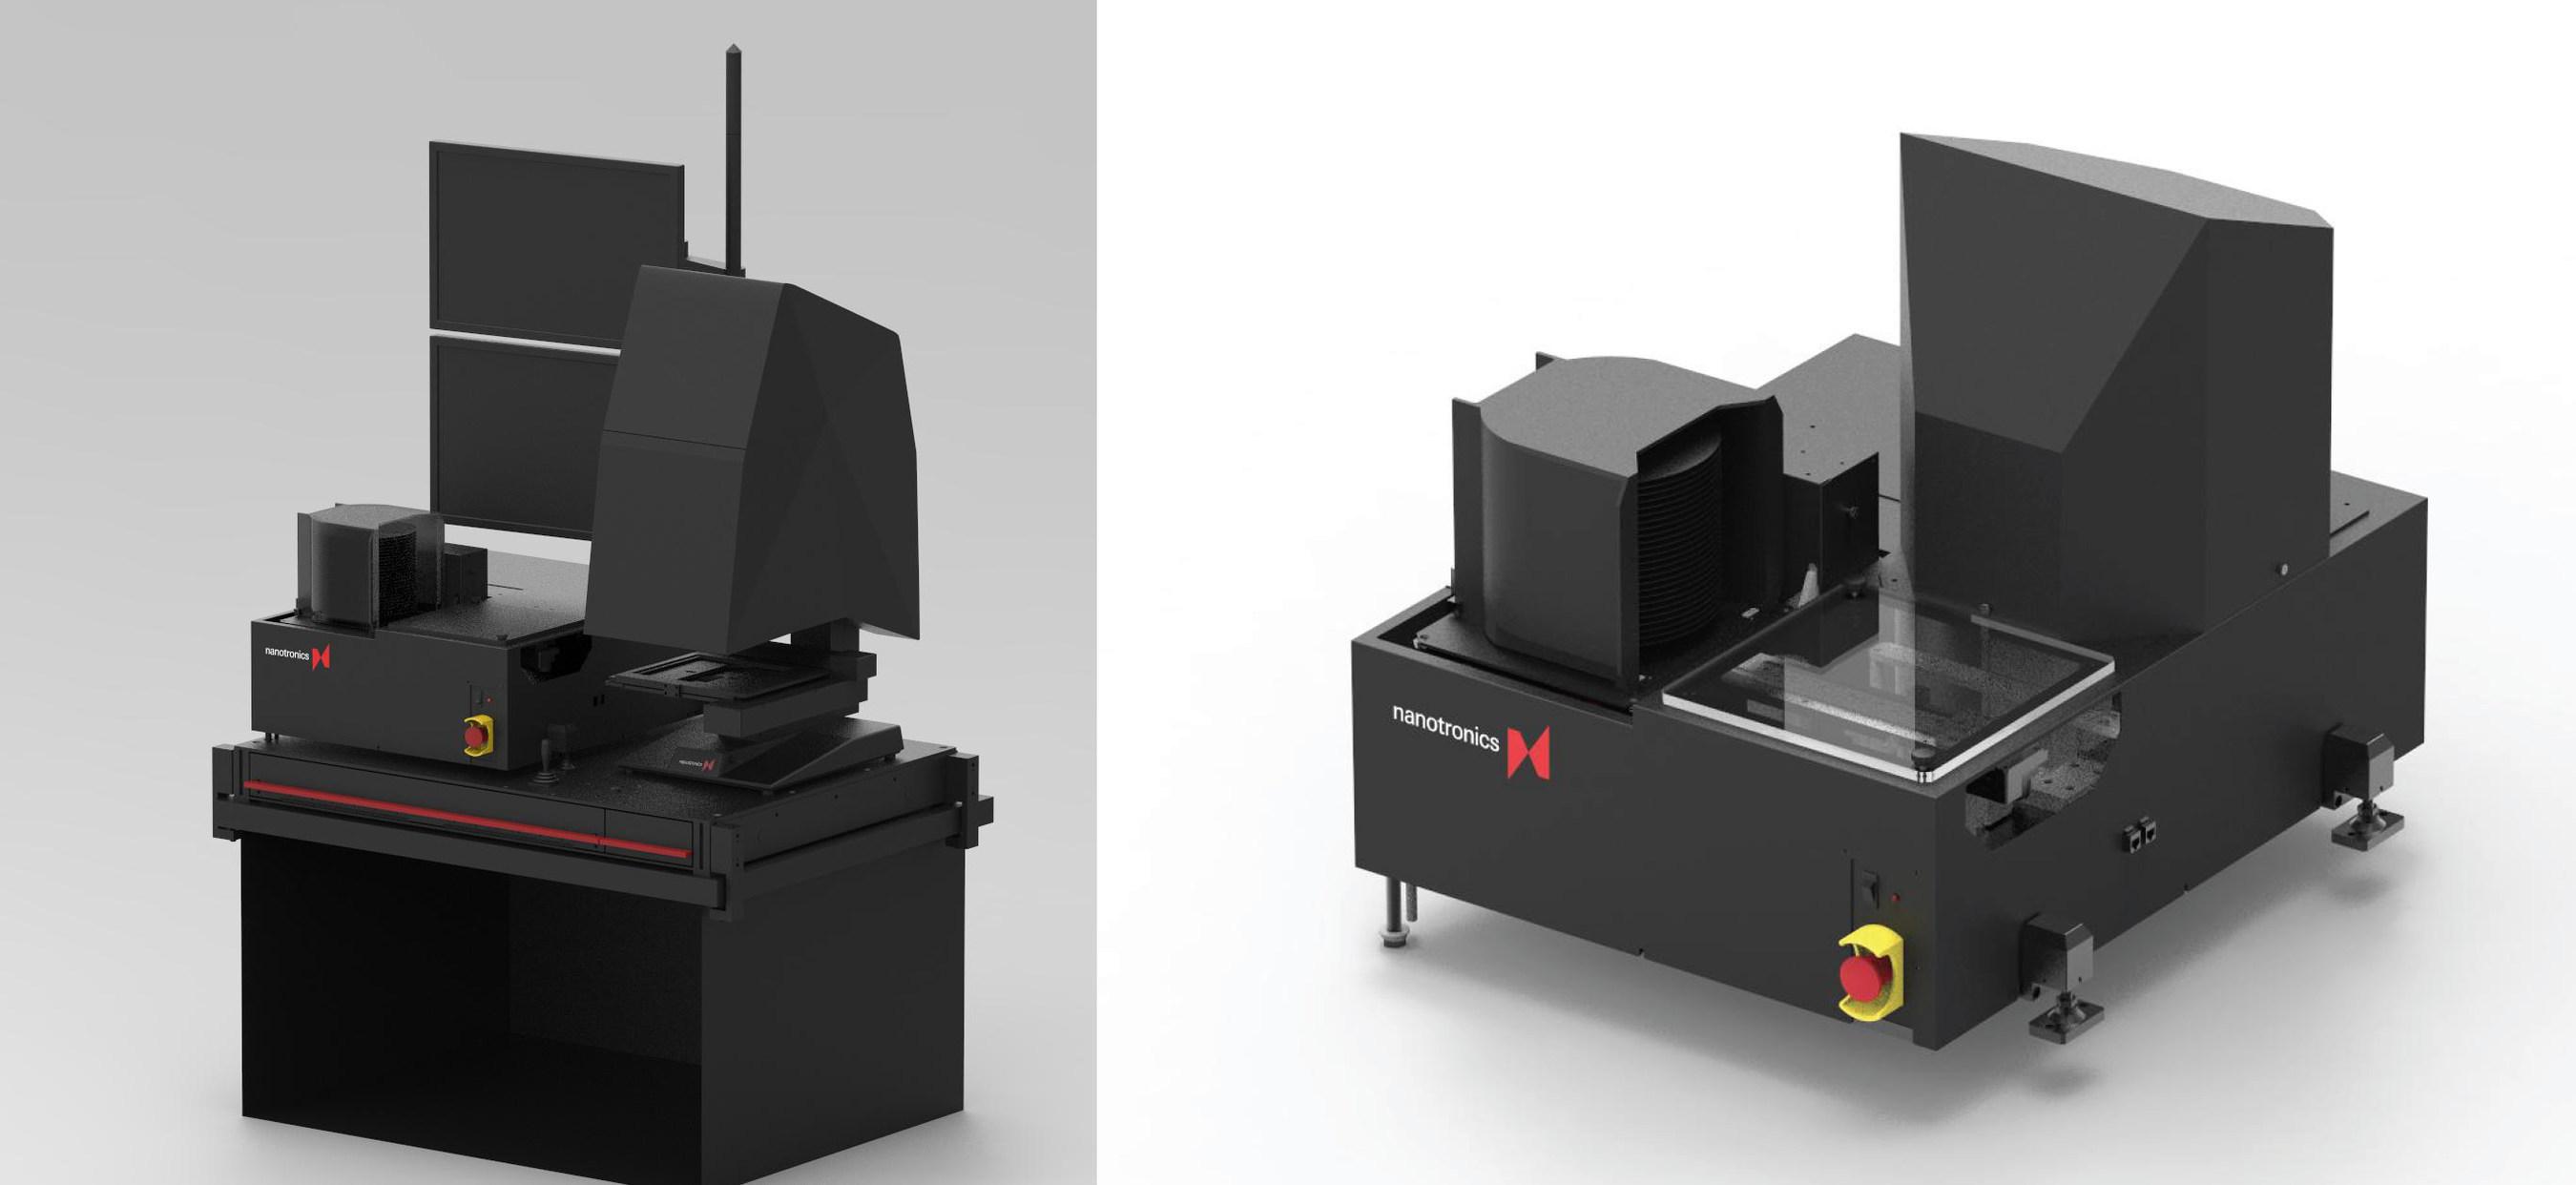 Nanotronics nSpec(R) 2.0 + Rapid Automated Macro Inspection